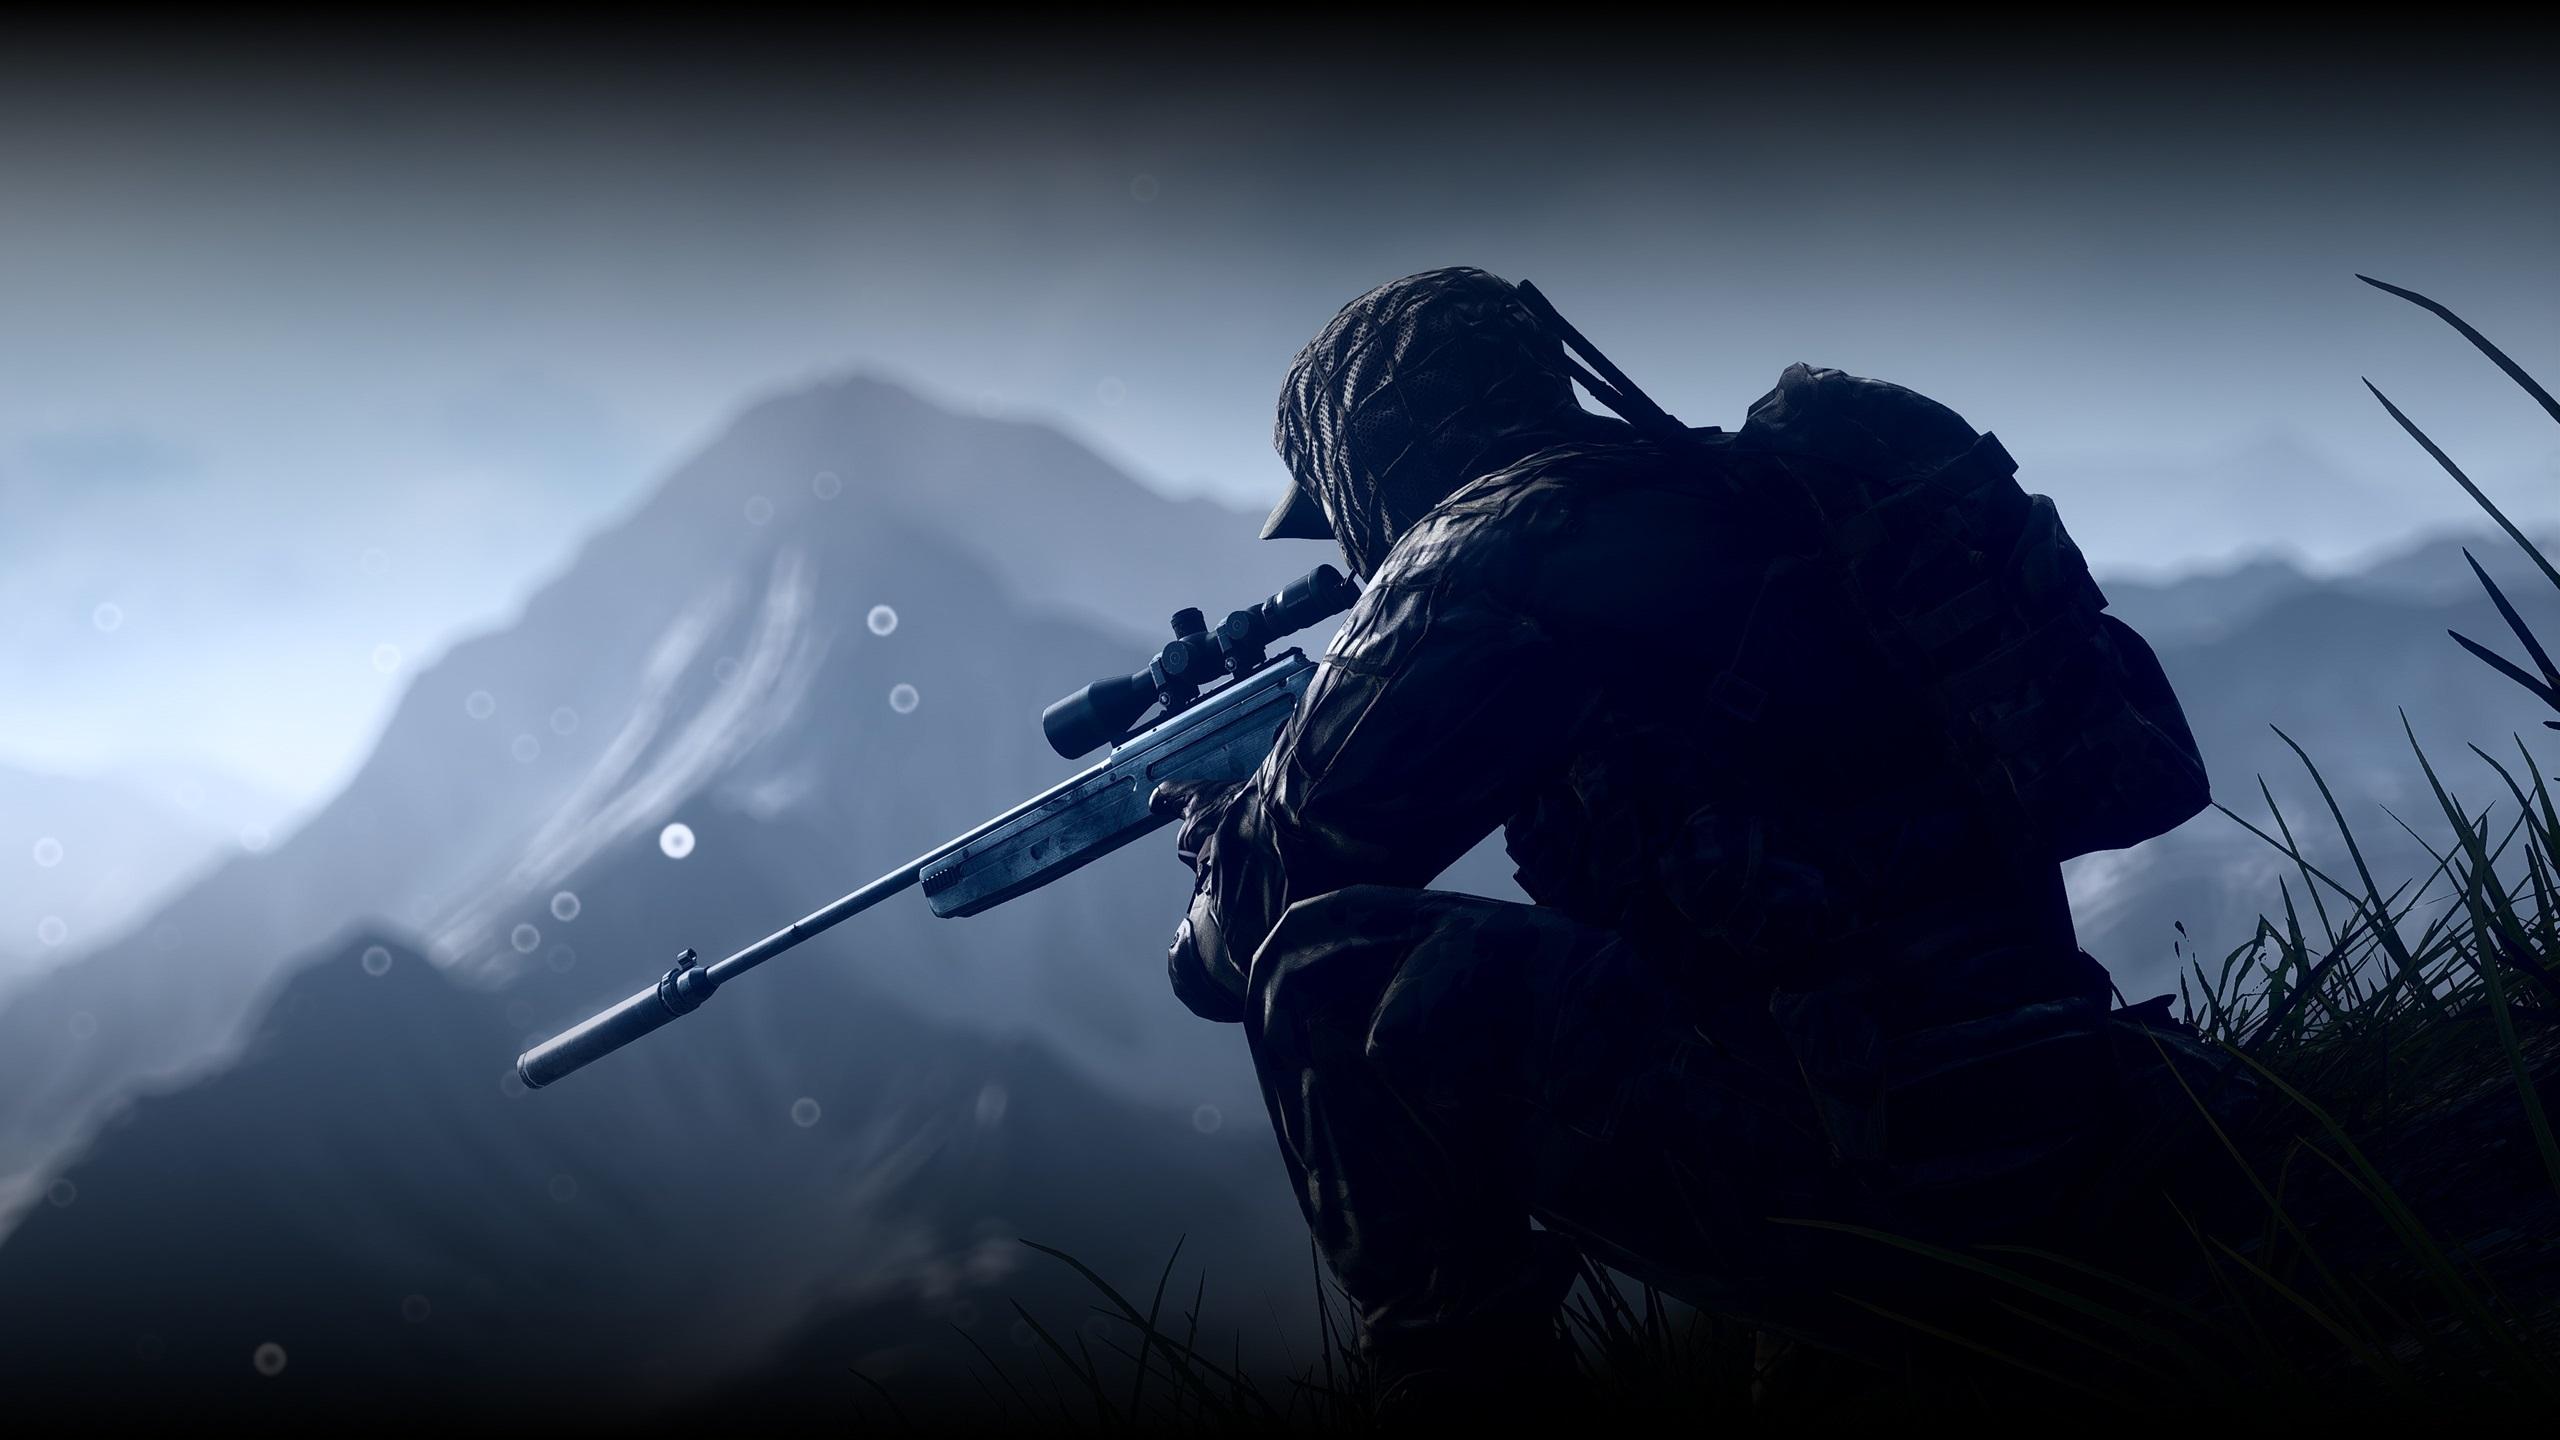 Wallpaper Battlefield 4, Soldier, Sniper 3840x2160 UHD 4K